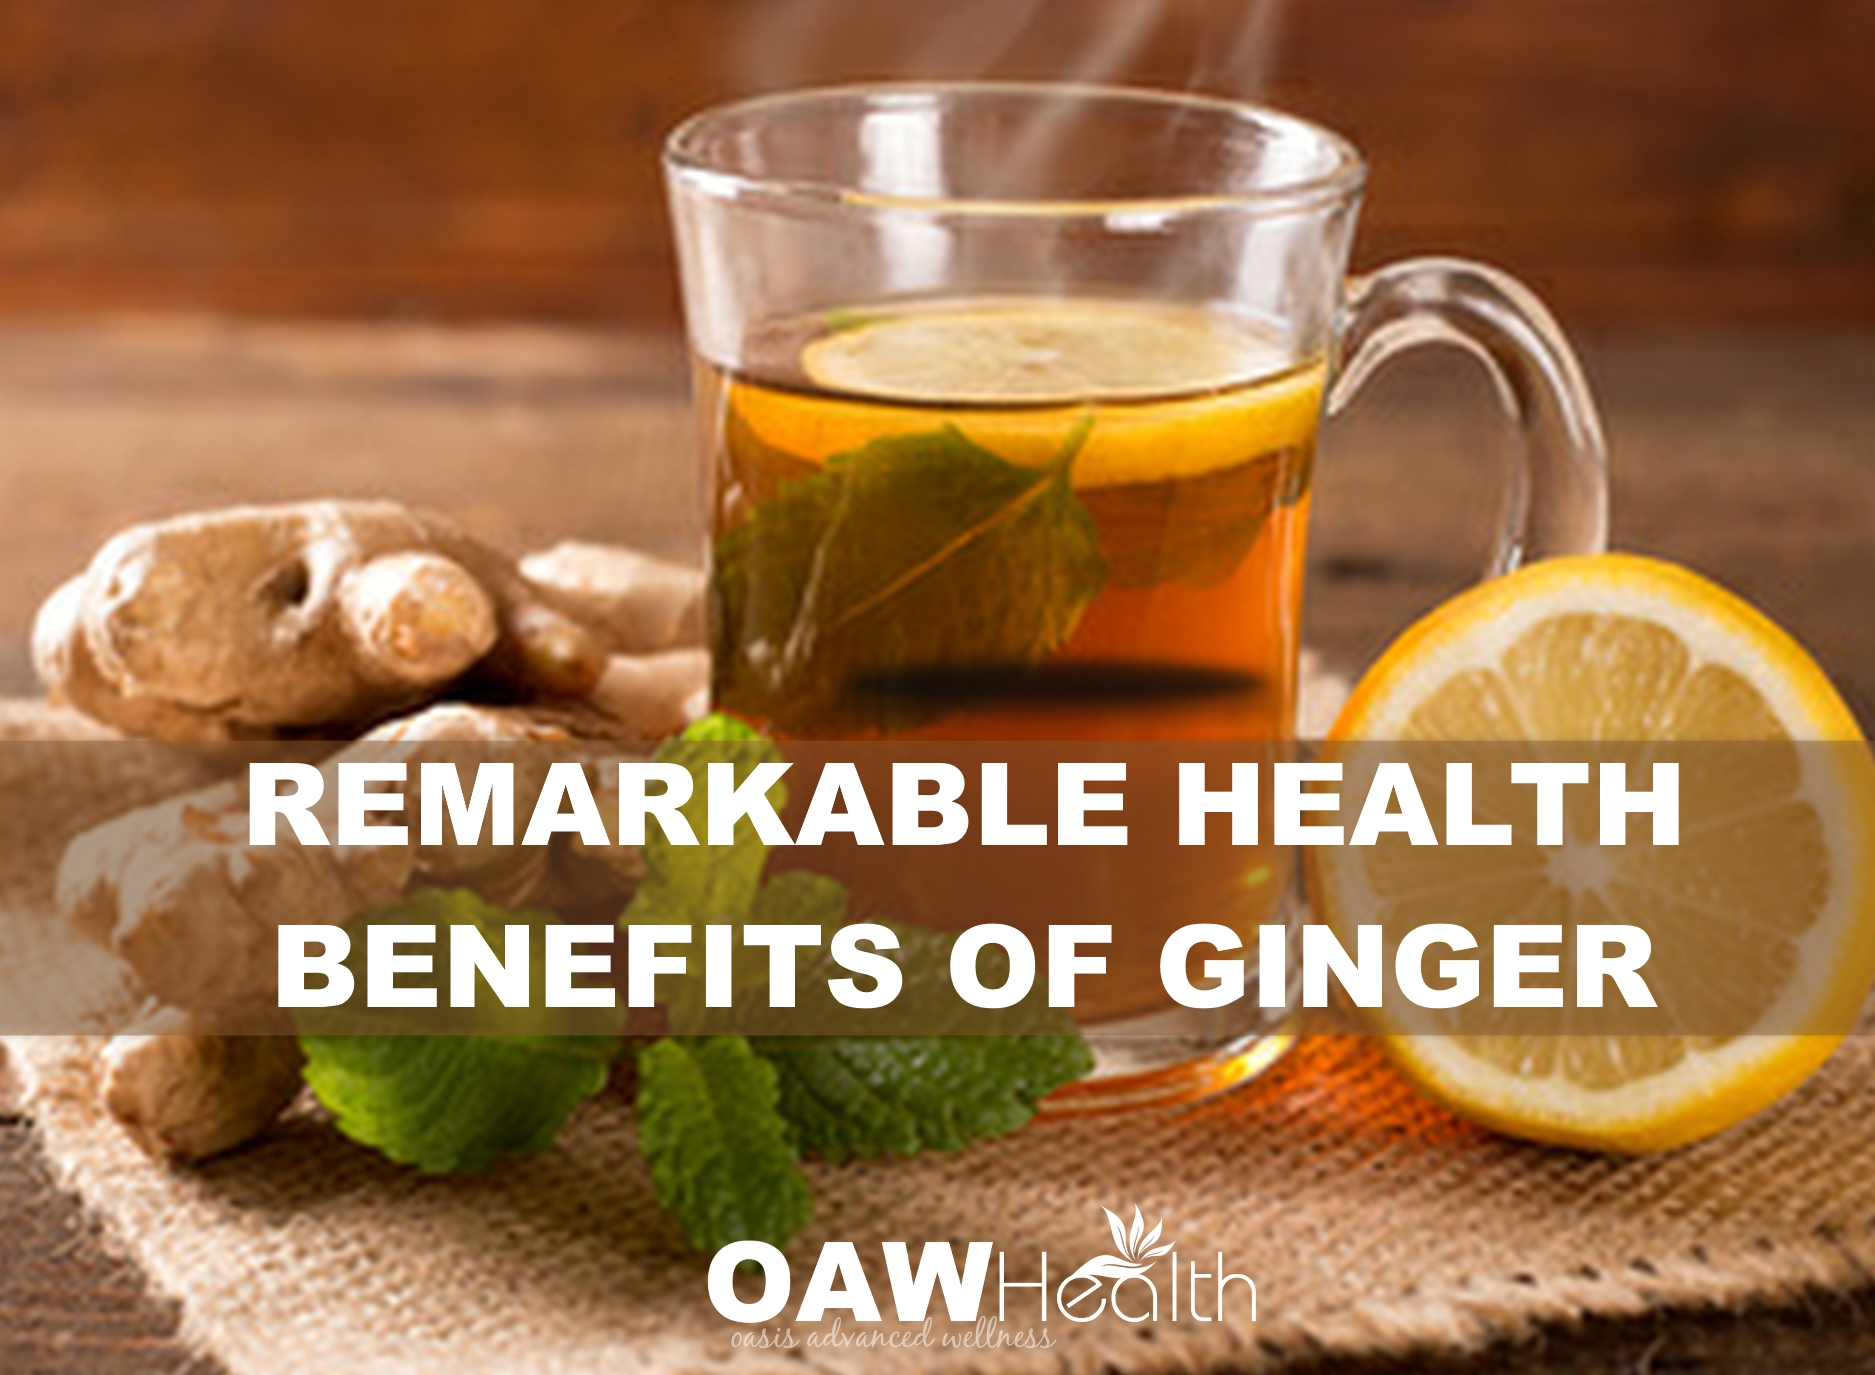 Remarkable Health Benefits of Ginger